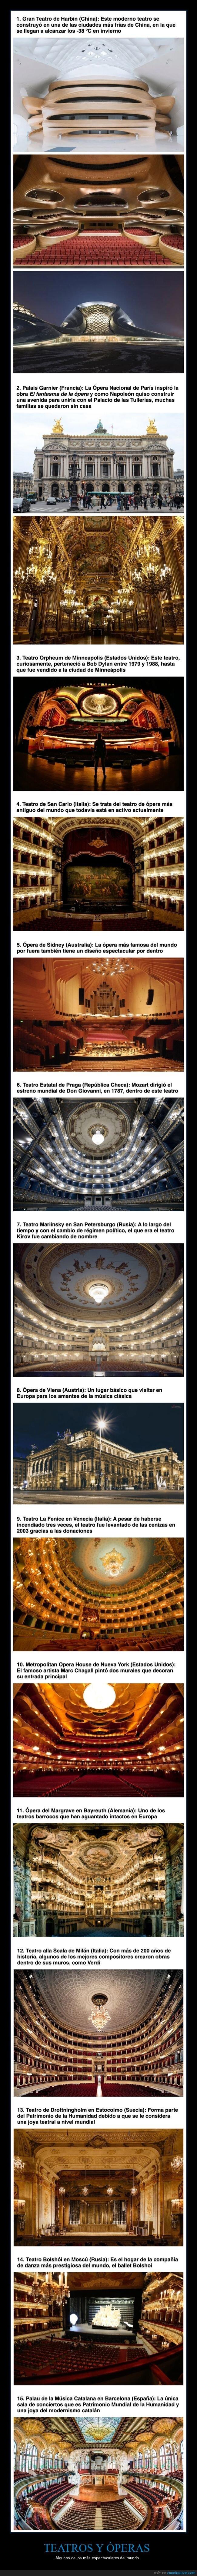 curiosidades,óperas,teatros